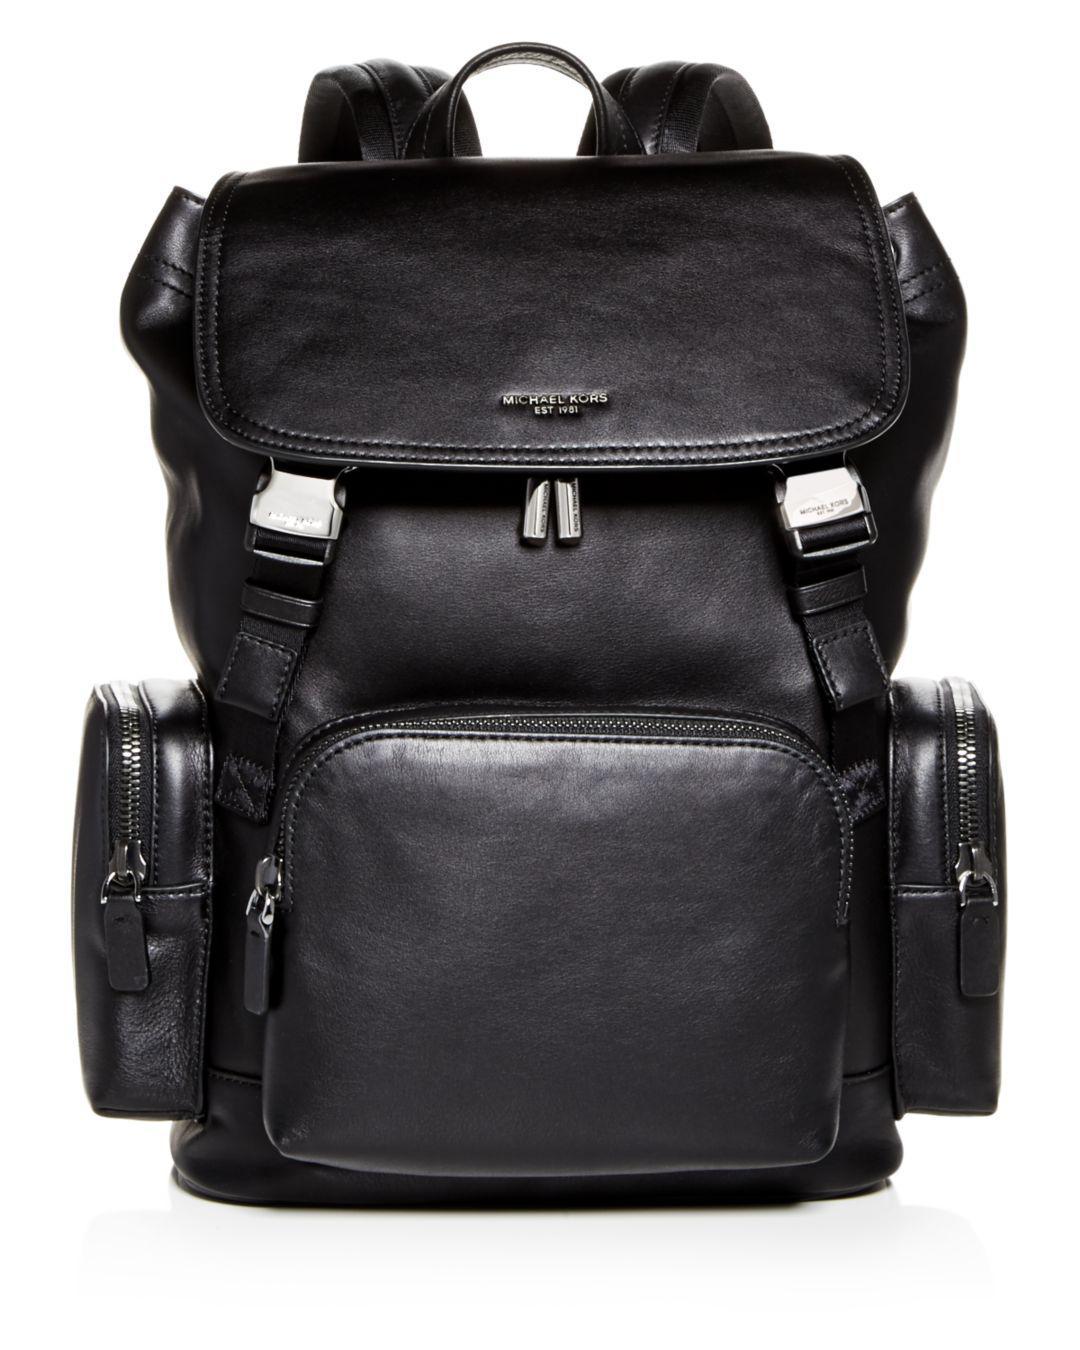 961ac2ec08c3 Michael Kors Henry Leather Backpack in Black for Men - Save 60% - Lyst